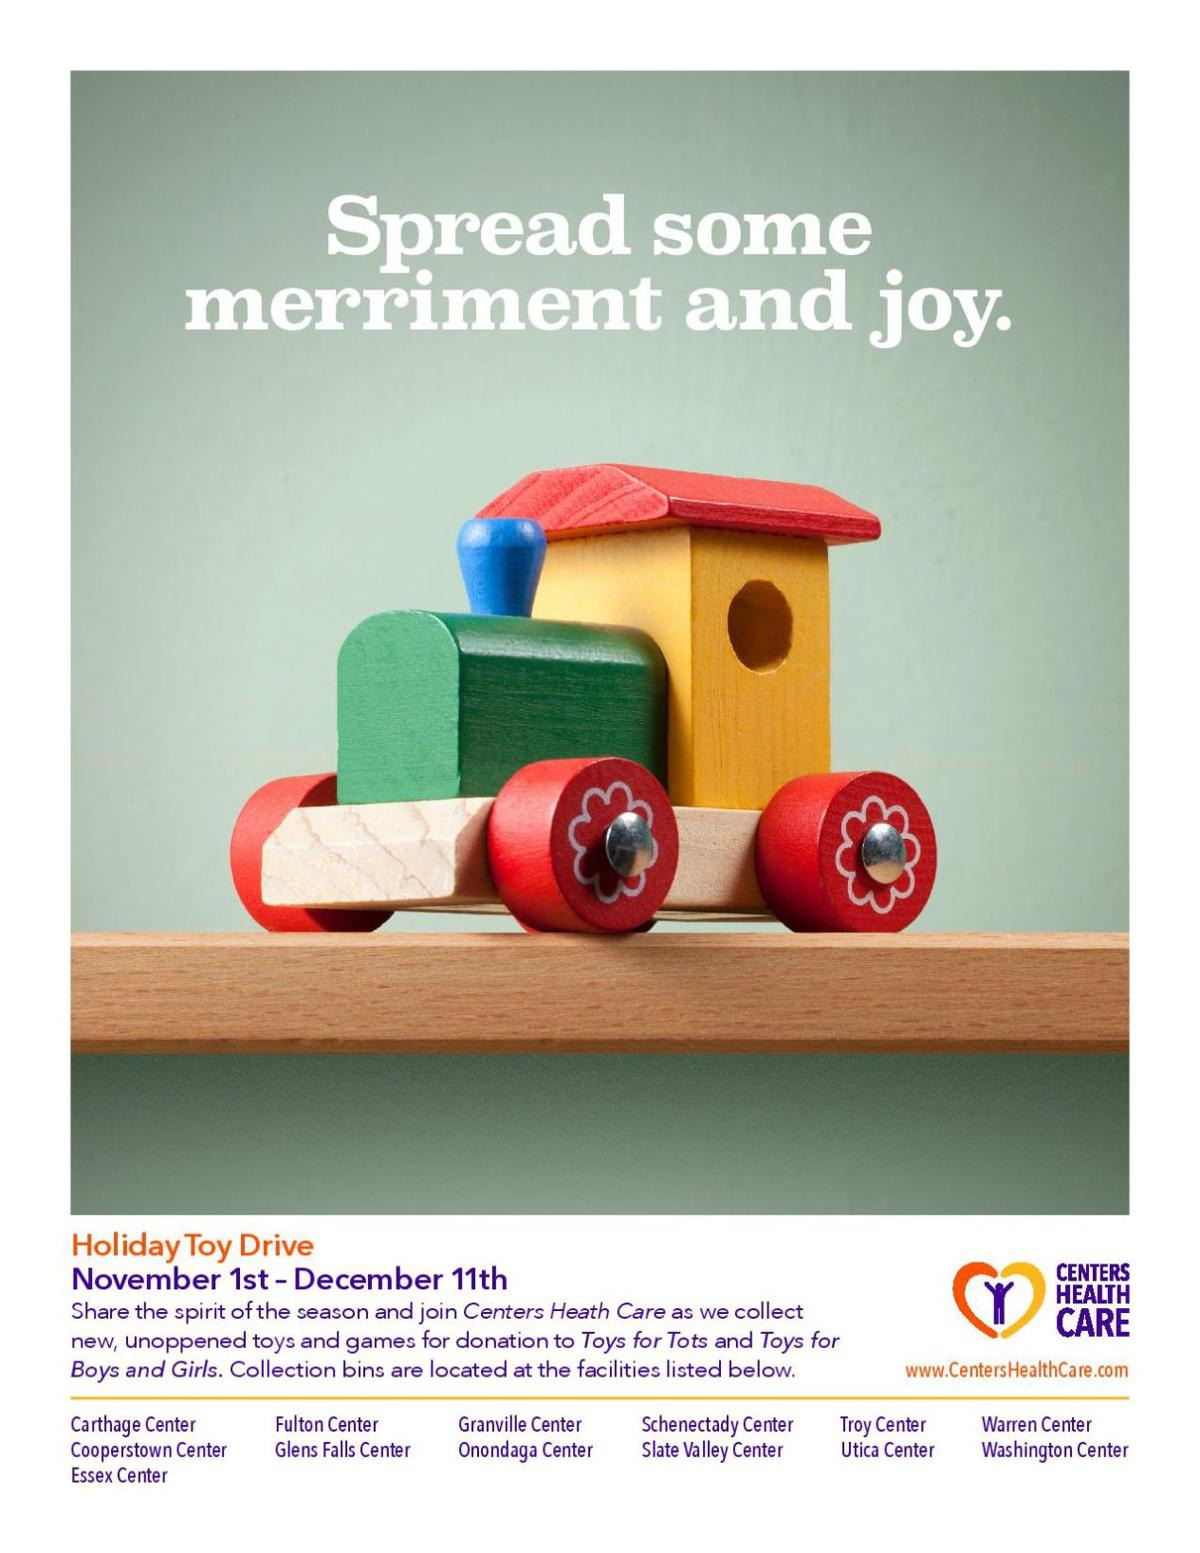 Toys For Toys 2017 Holiday Season